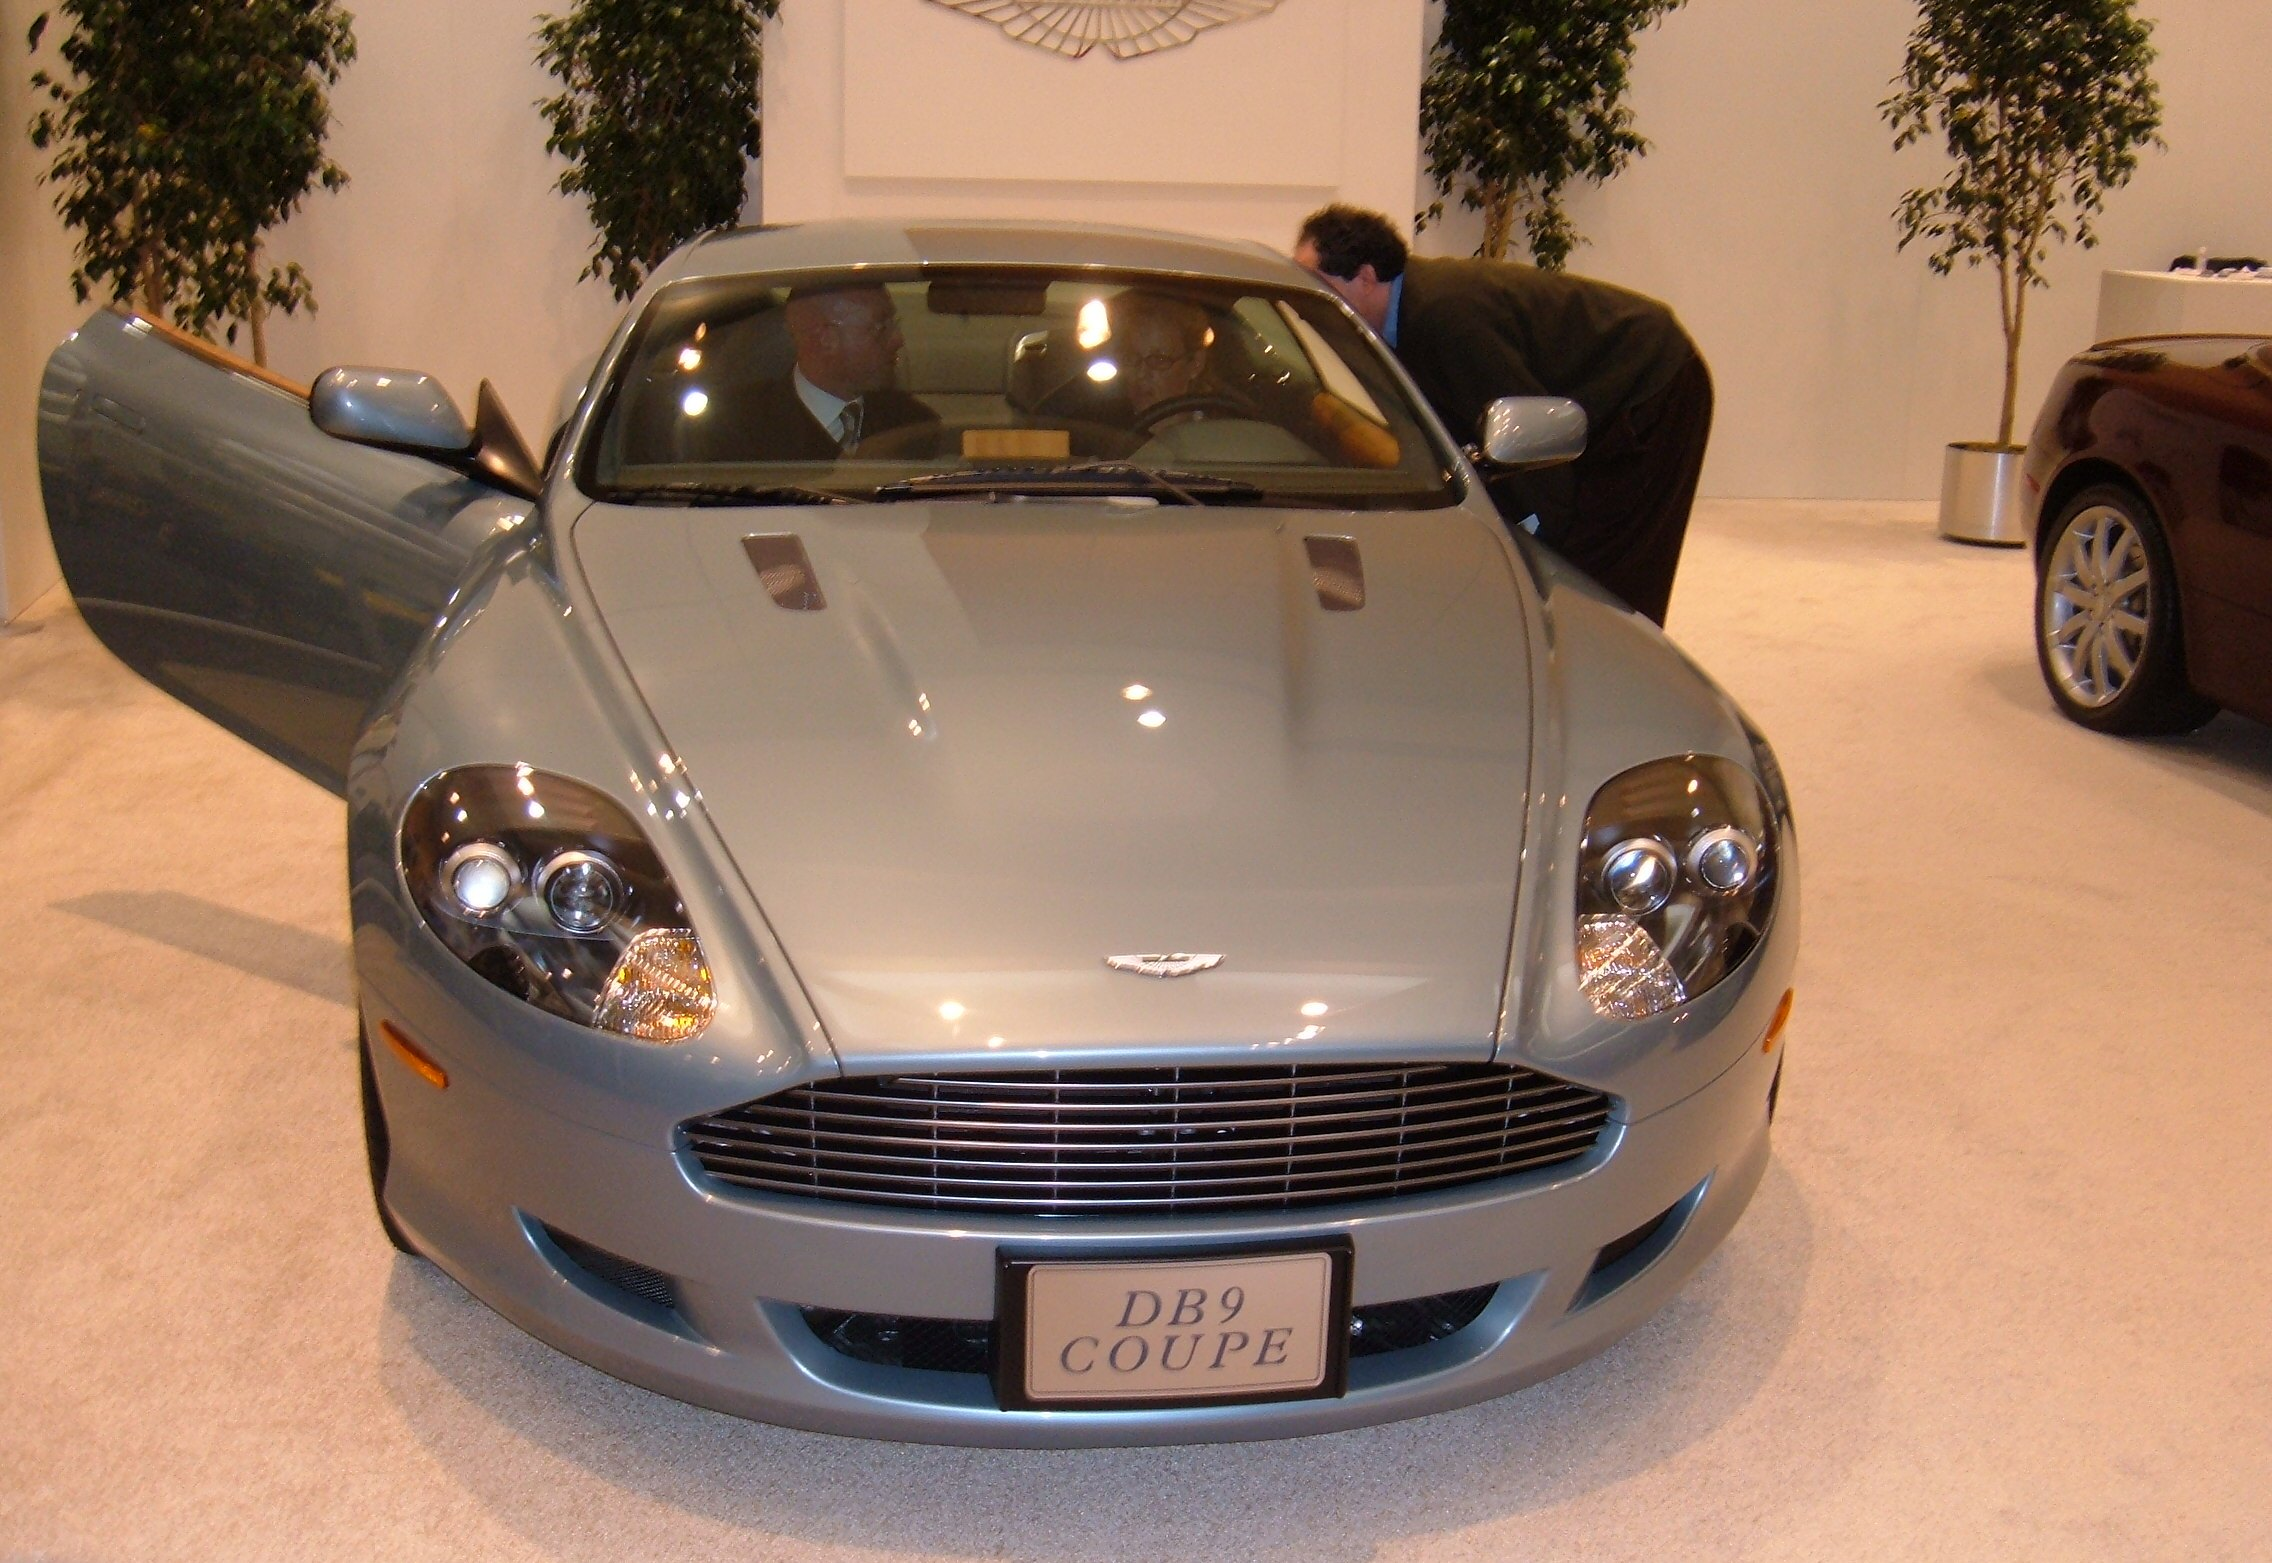 2005+aston+martin+db9+coupe